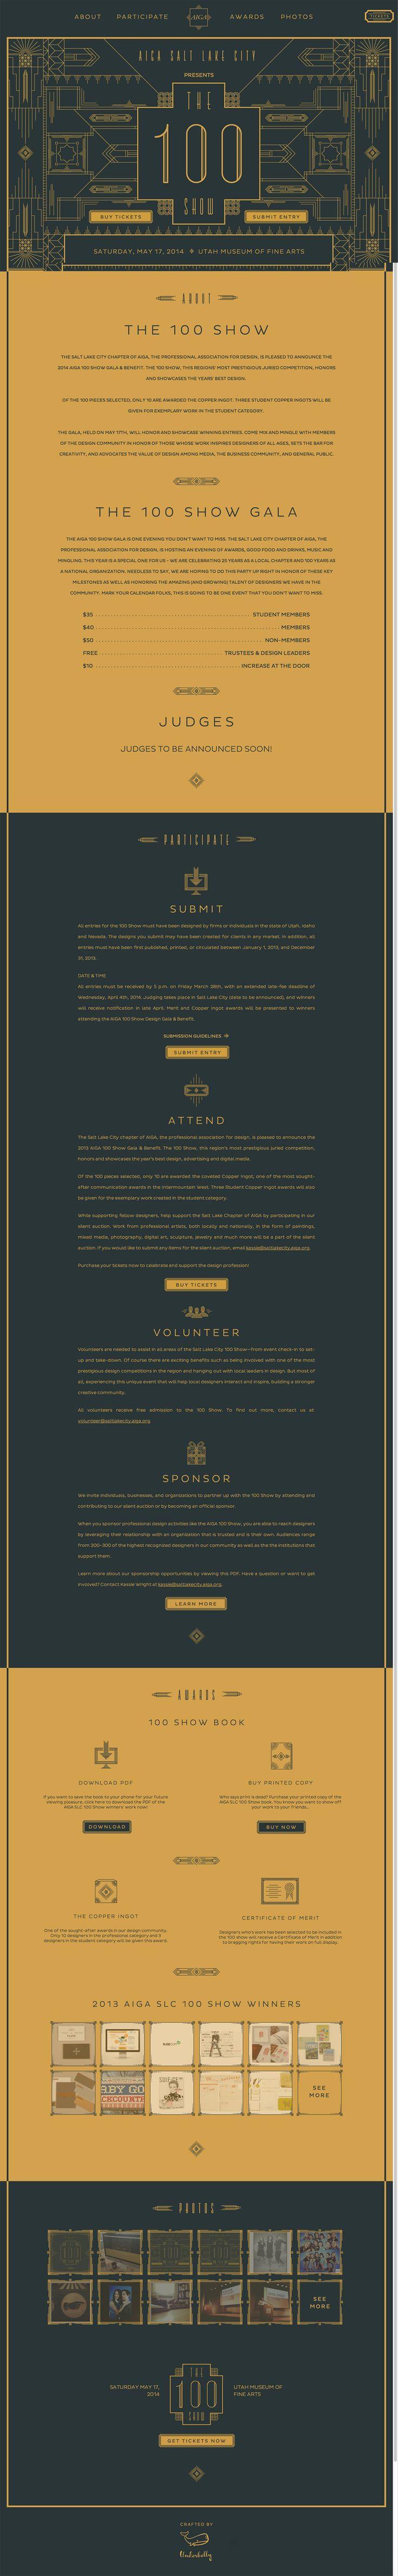 Web design: AIGA Salt Lake City The 100 Show